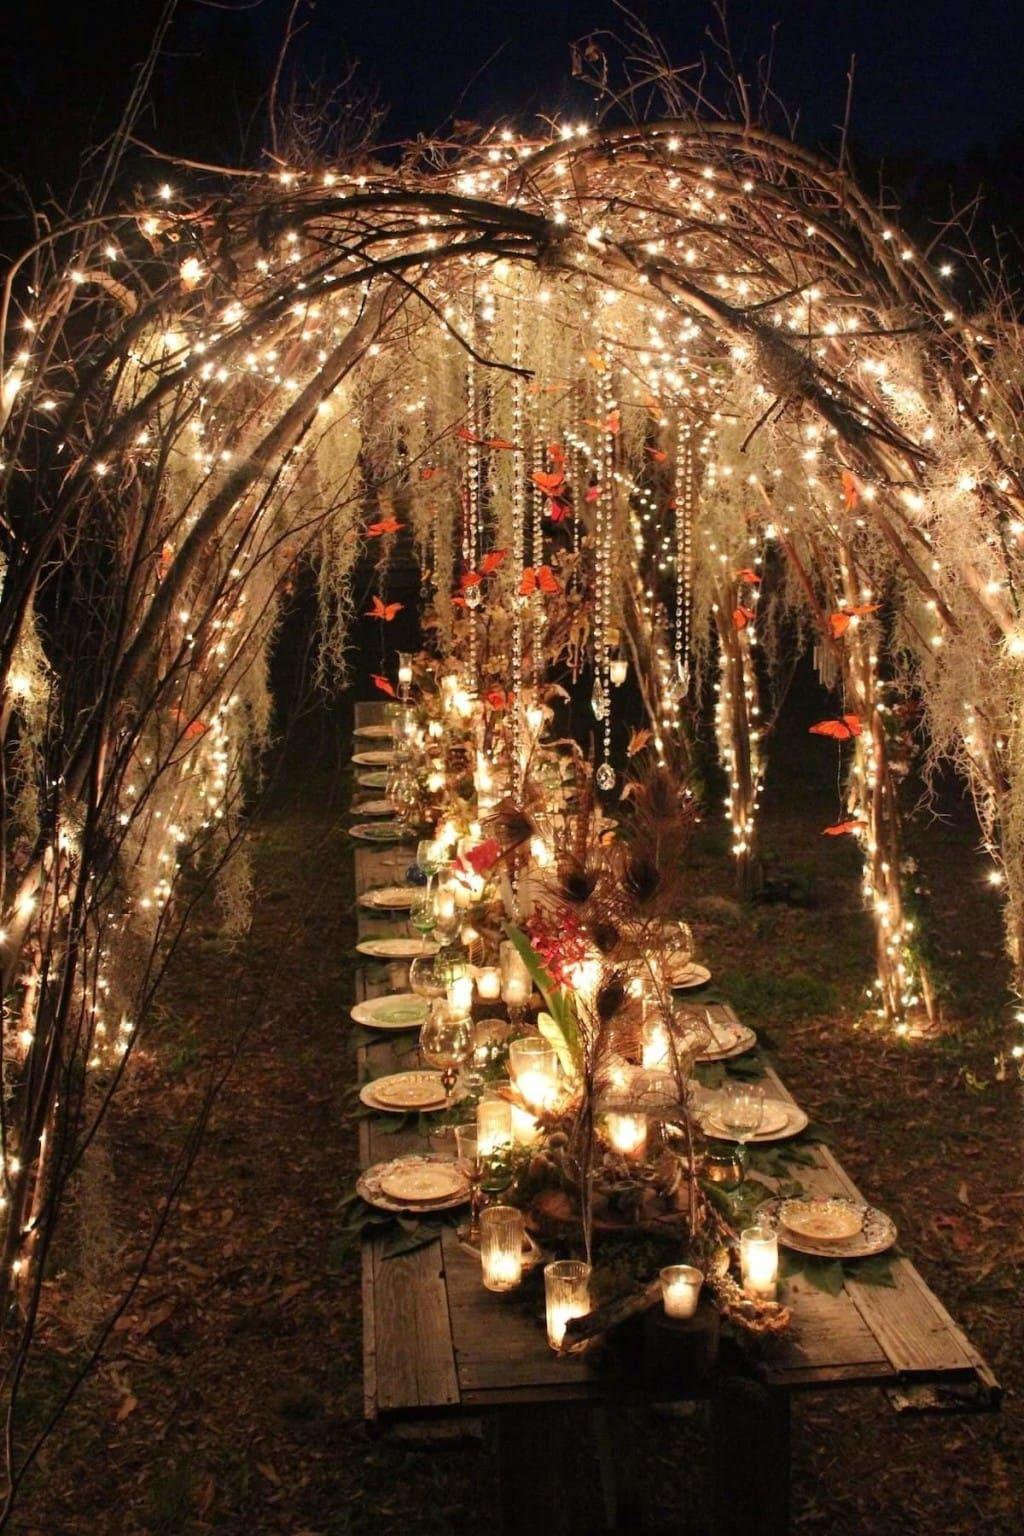 25 Stunning Wedding Lighting Ideas For Your Big Day Wedding Lights Outdoor Wedding Dream Wedding